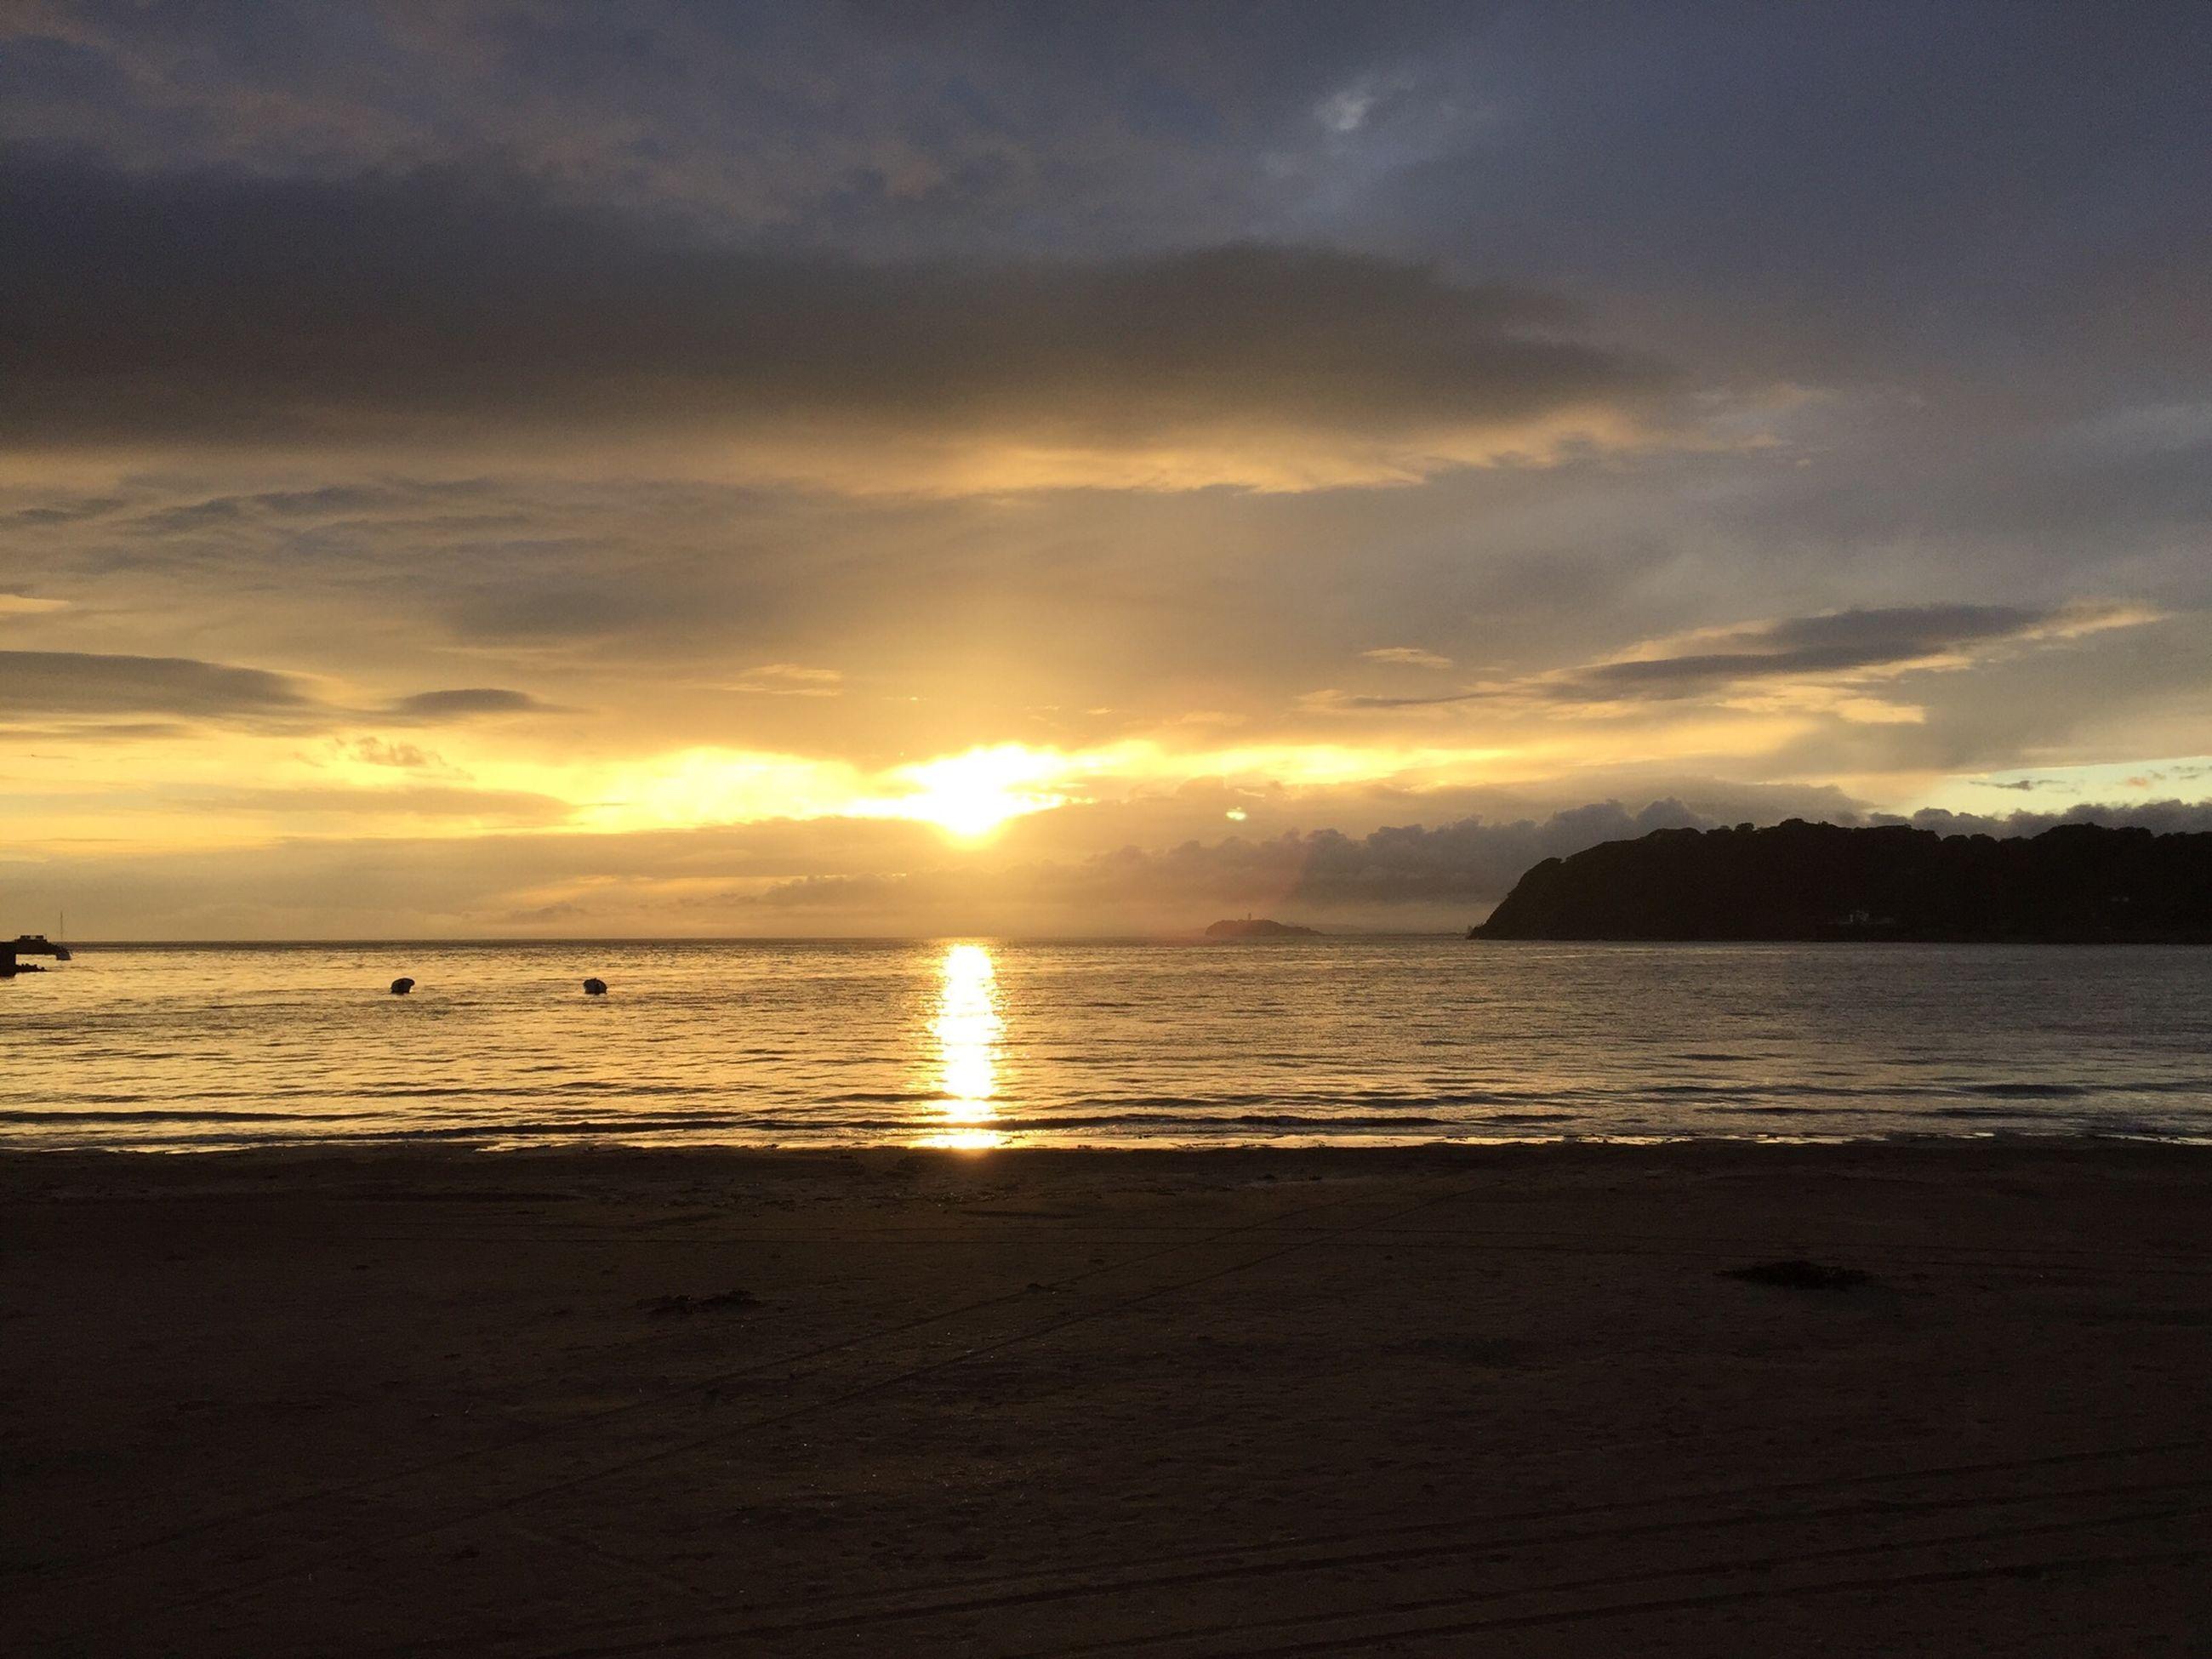 sunset, sea, water, scenics, horizon over water, tranquil scene, beach, sun, sky, beauty in nature, tranquility, shore, orange color, idyllic, cloud - sky, nature, reflection, sunlight, silhouette, cloud